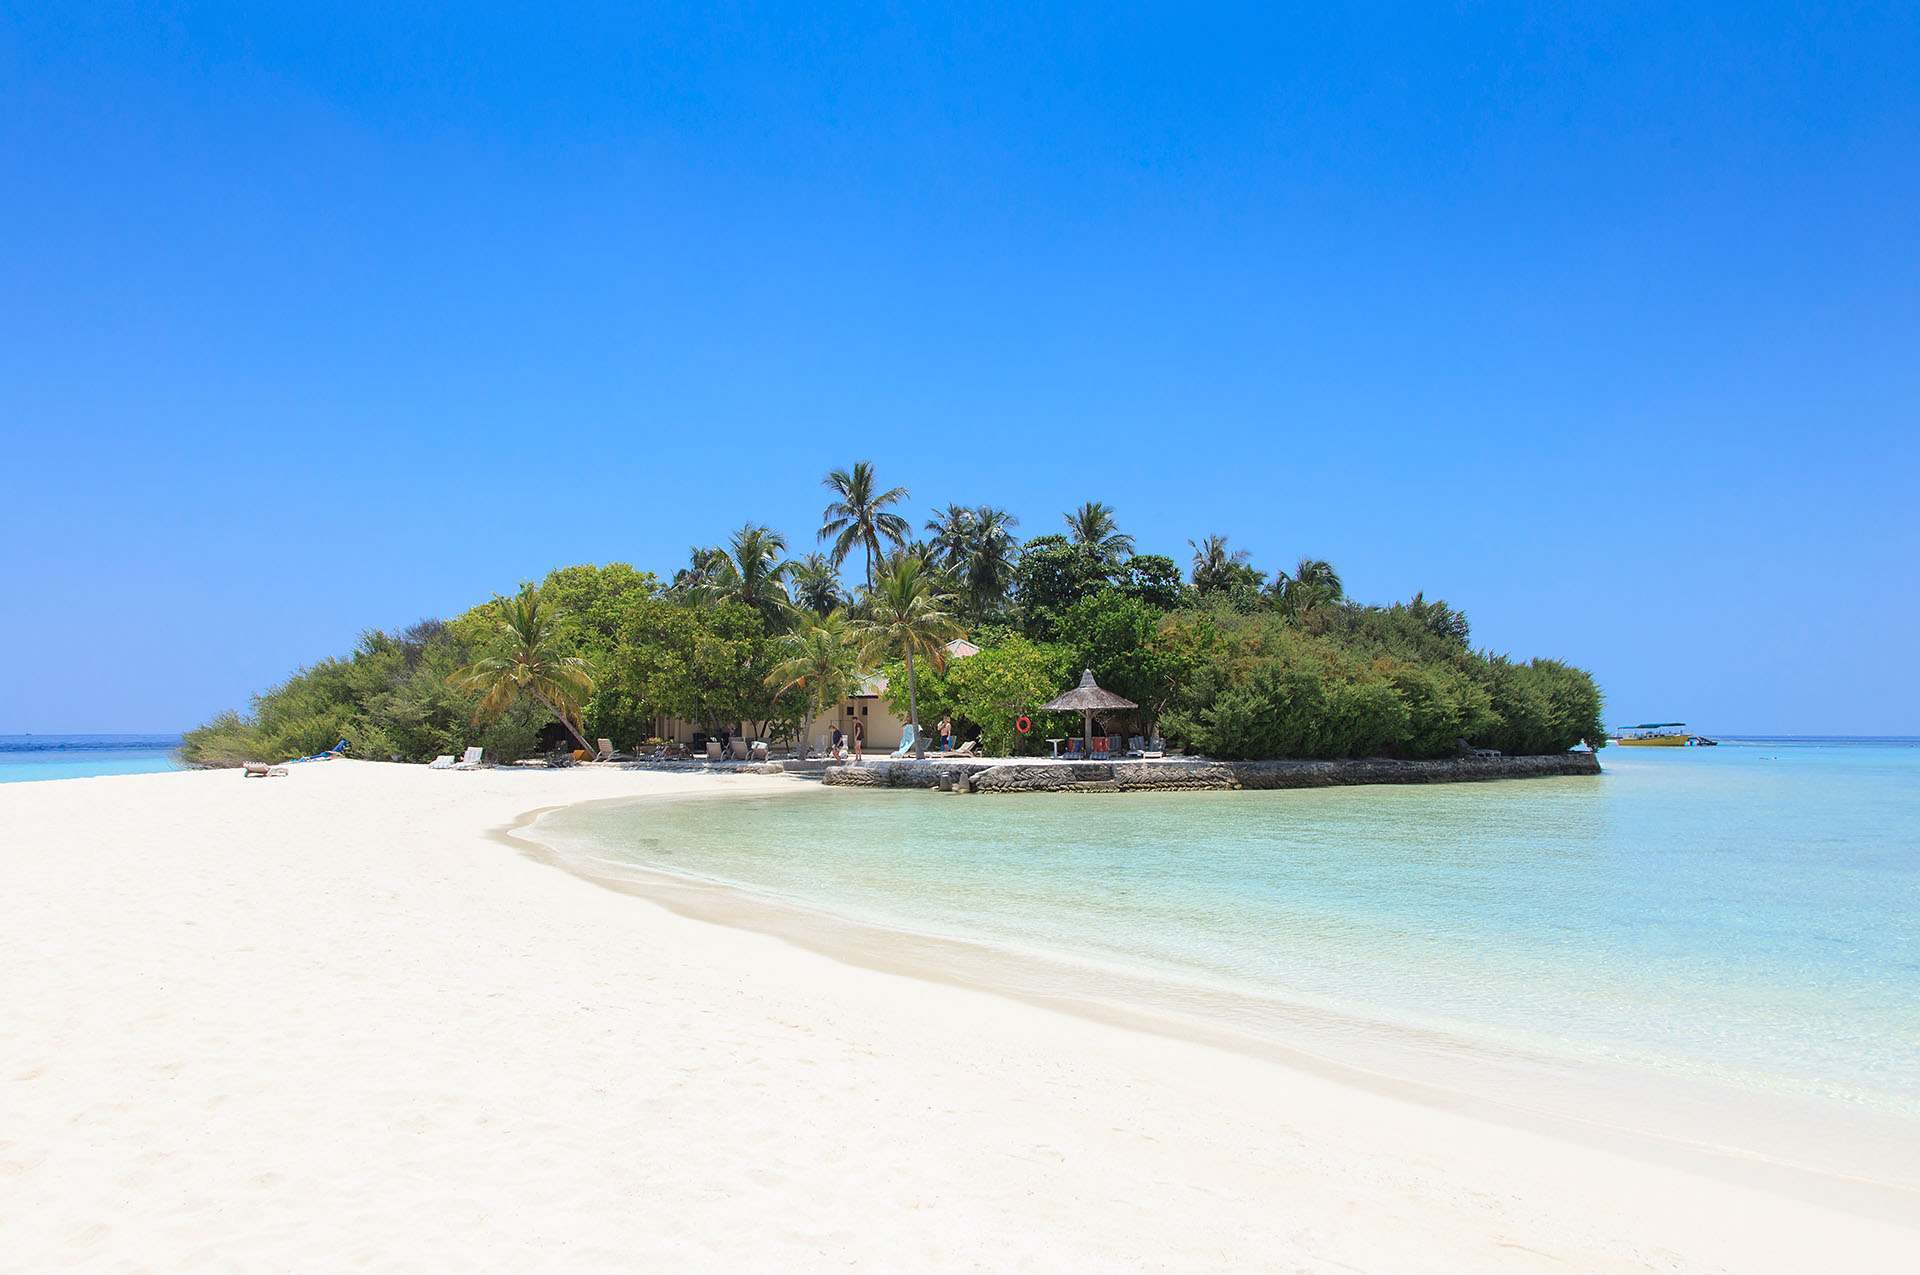 Embudu-Village-The-Island-Beach